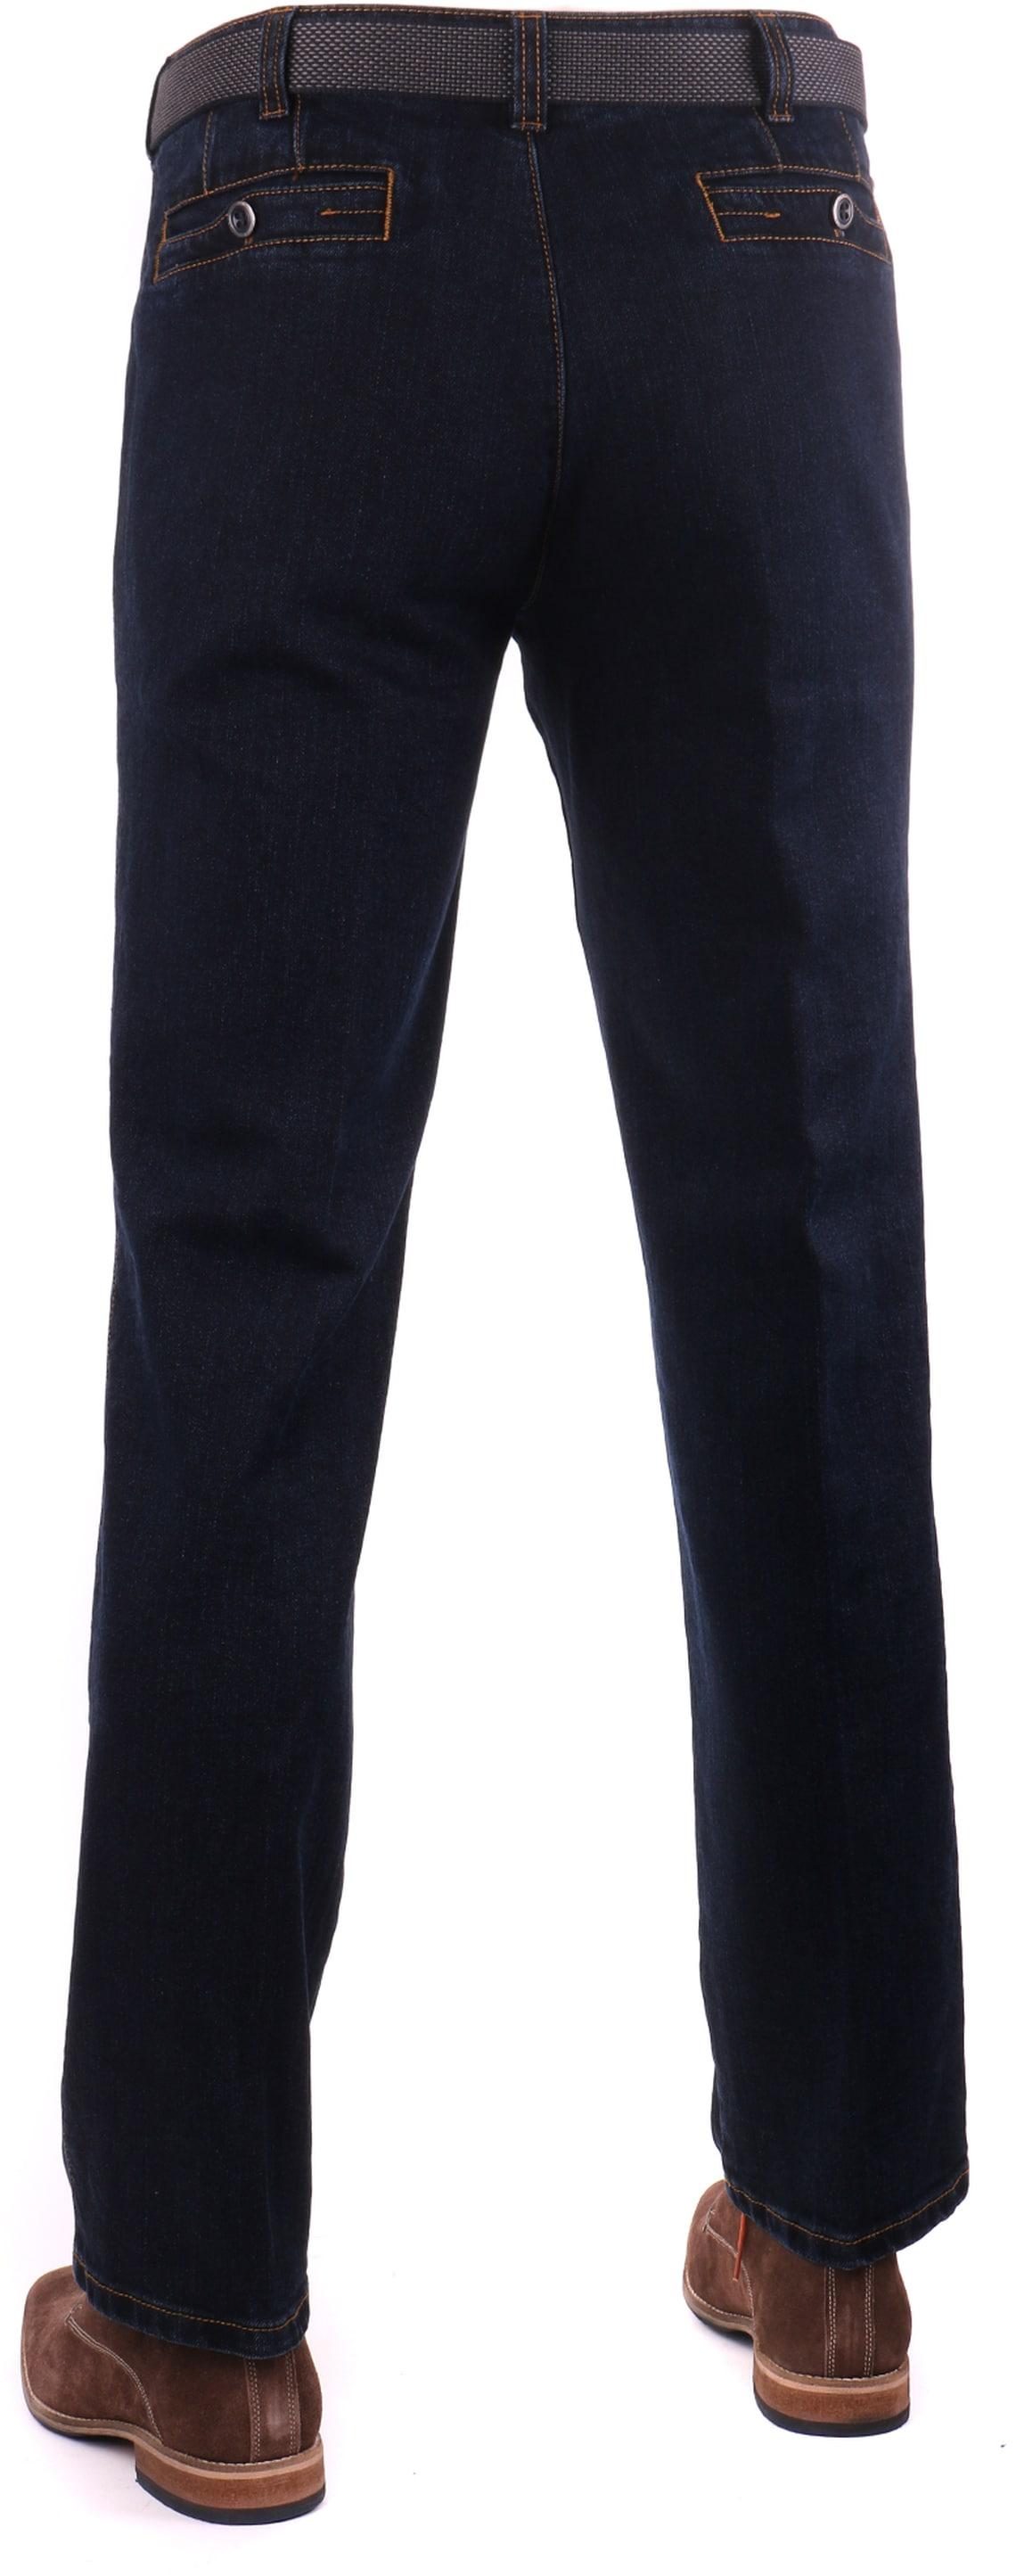 Meyer Jeans Diego Blau foto 1